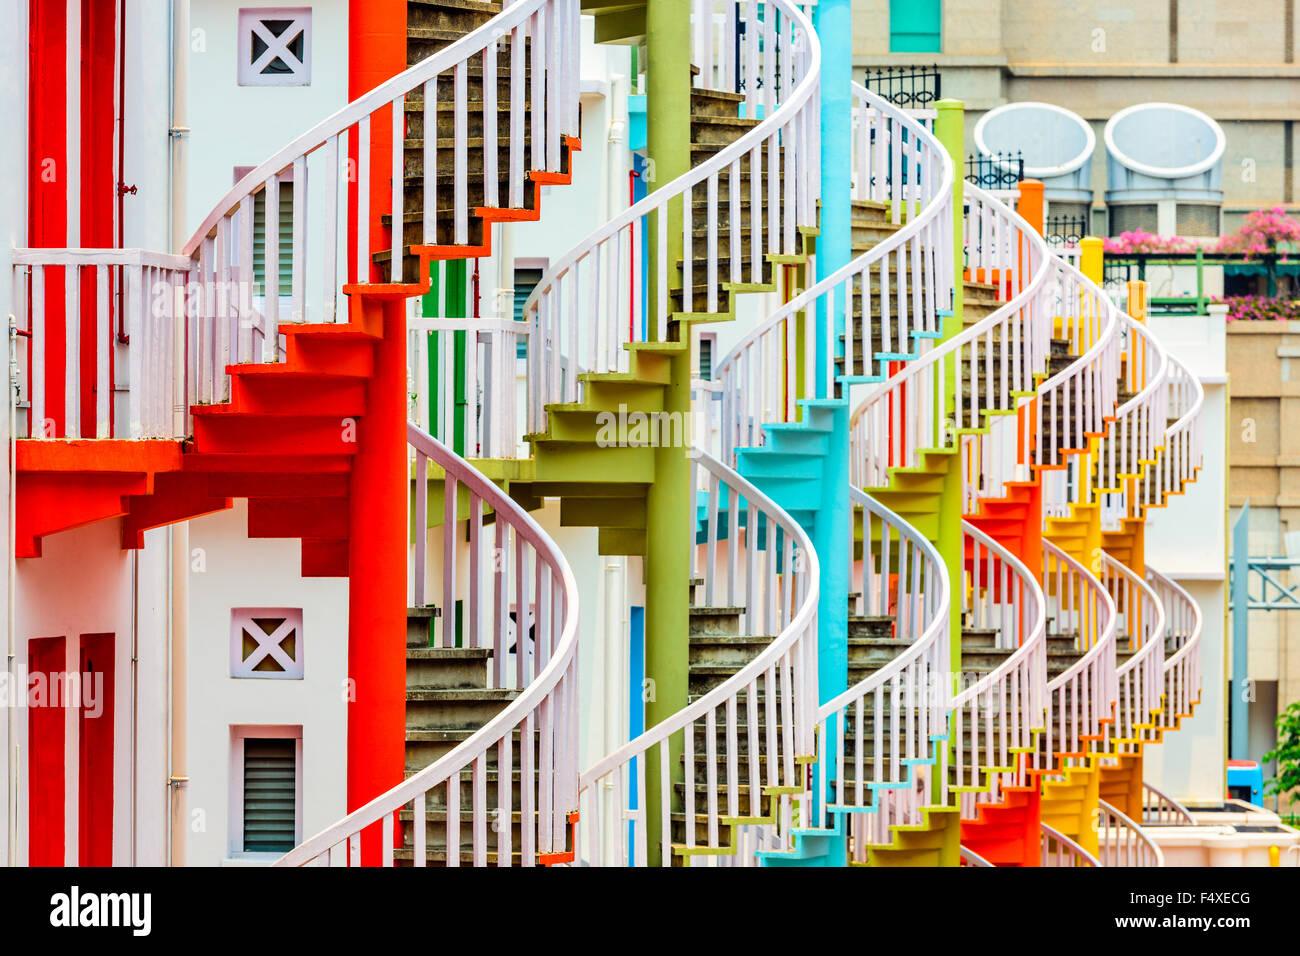 Bugis Village, Singapore spire staircases. - Stock Image